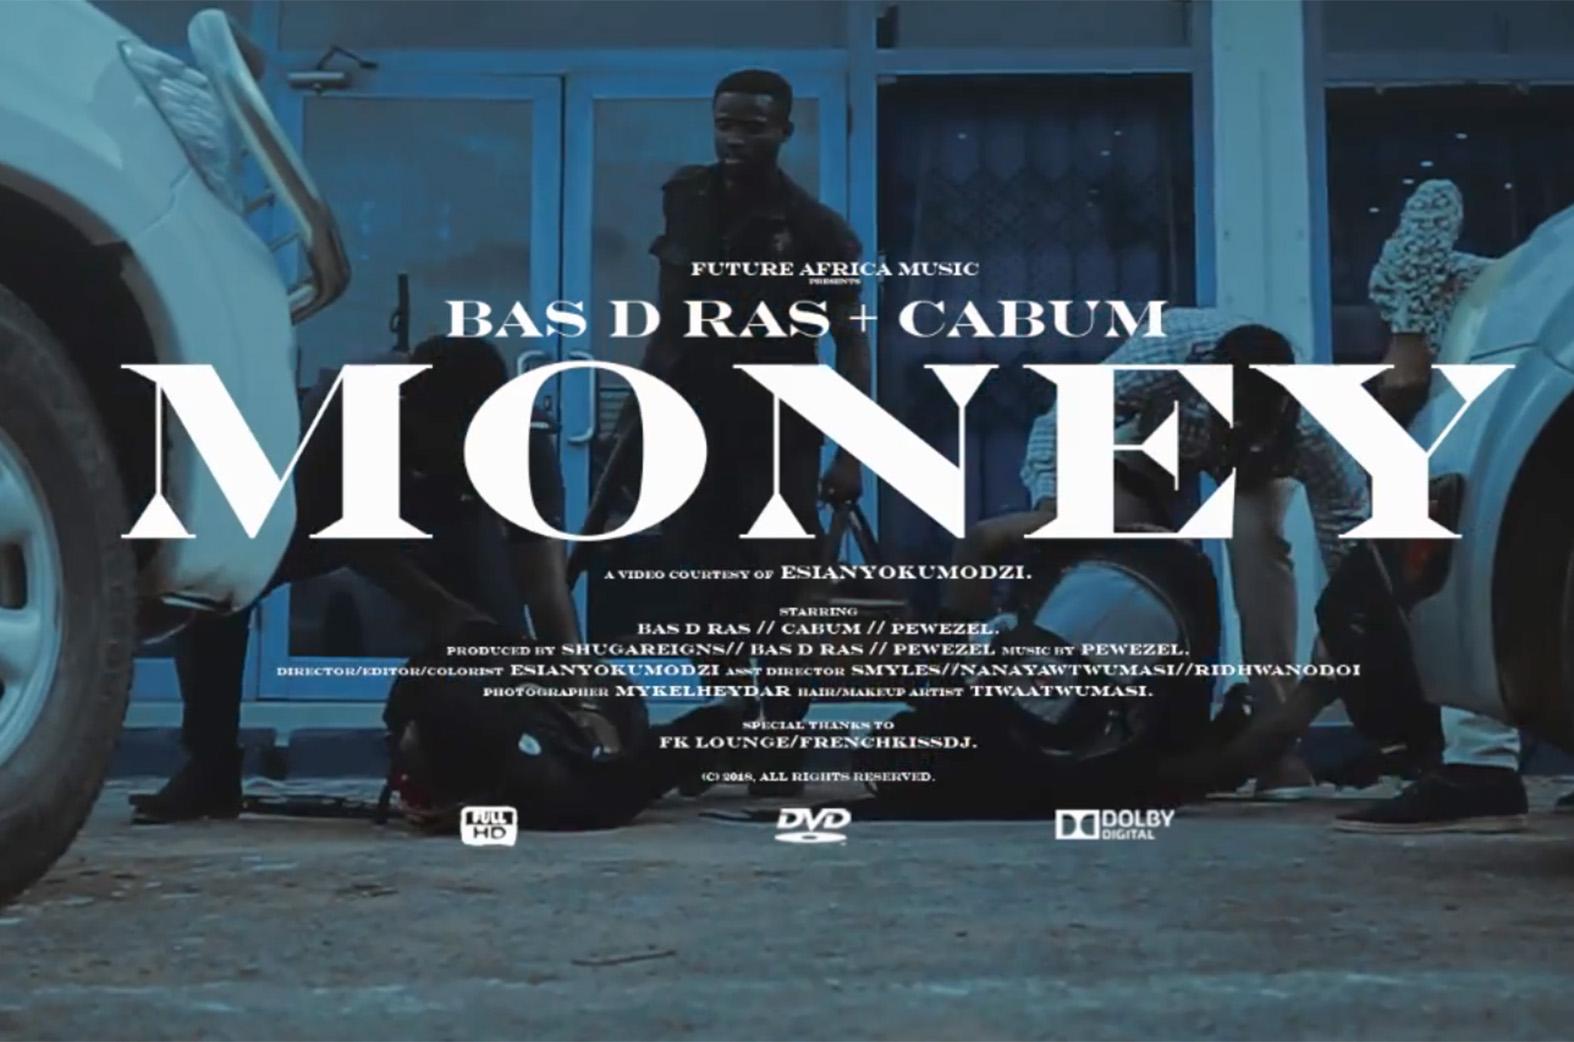 Video: Money by Bas D Ras feat. Cabum